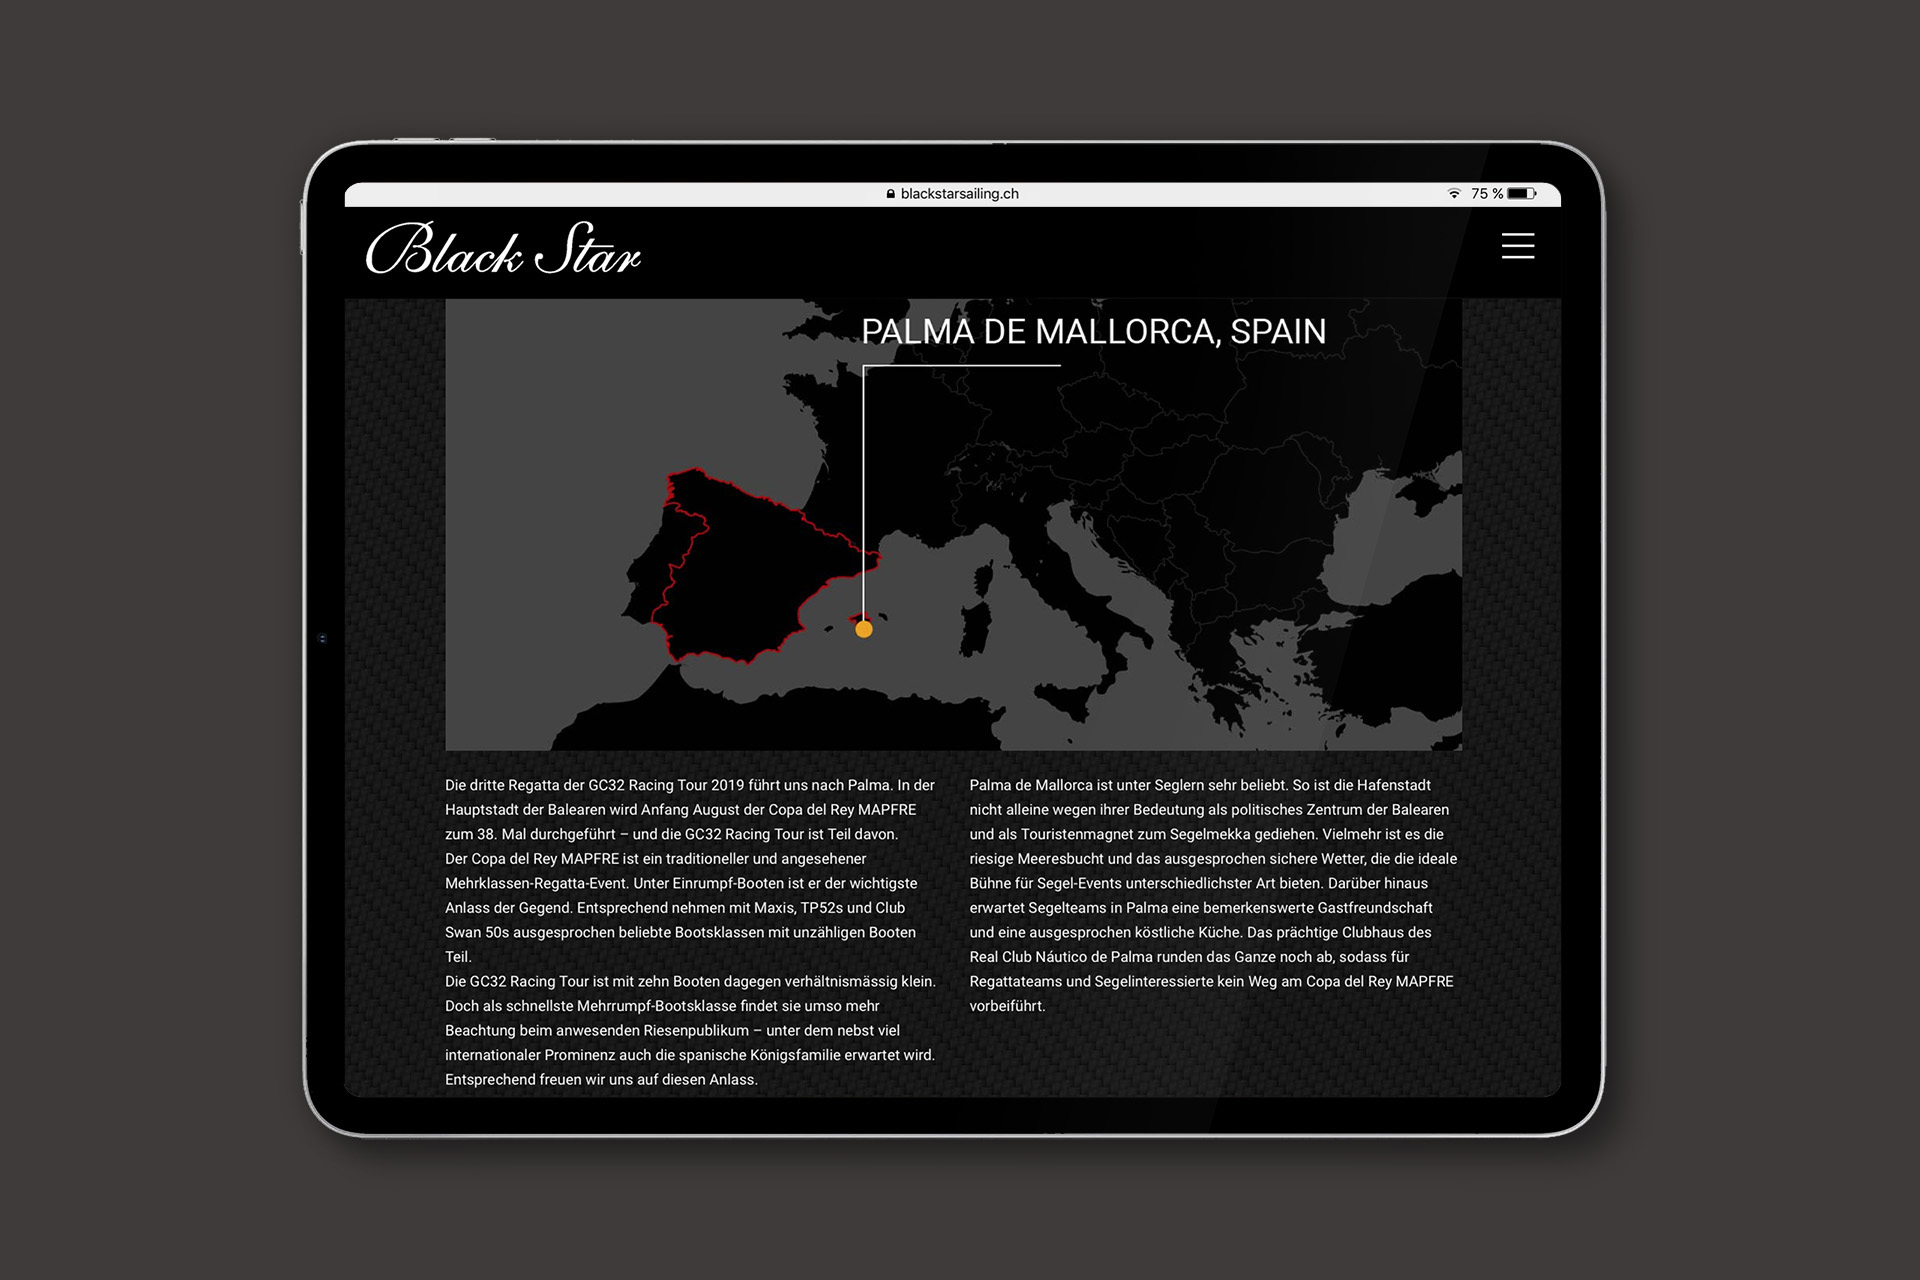 BlackStarSailing_iPad_19